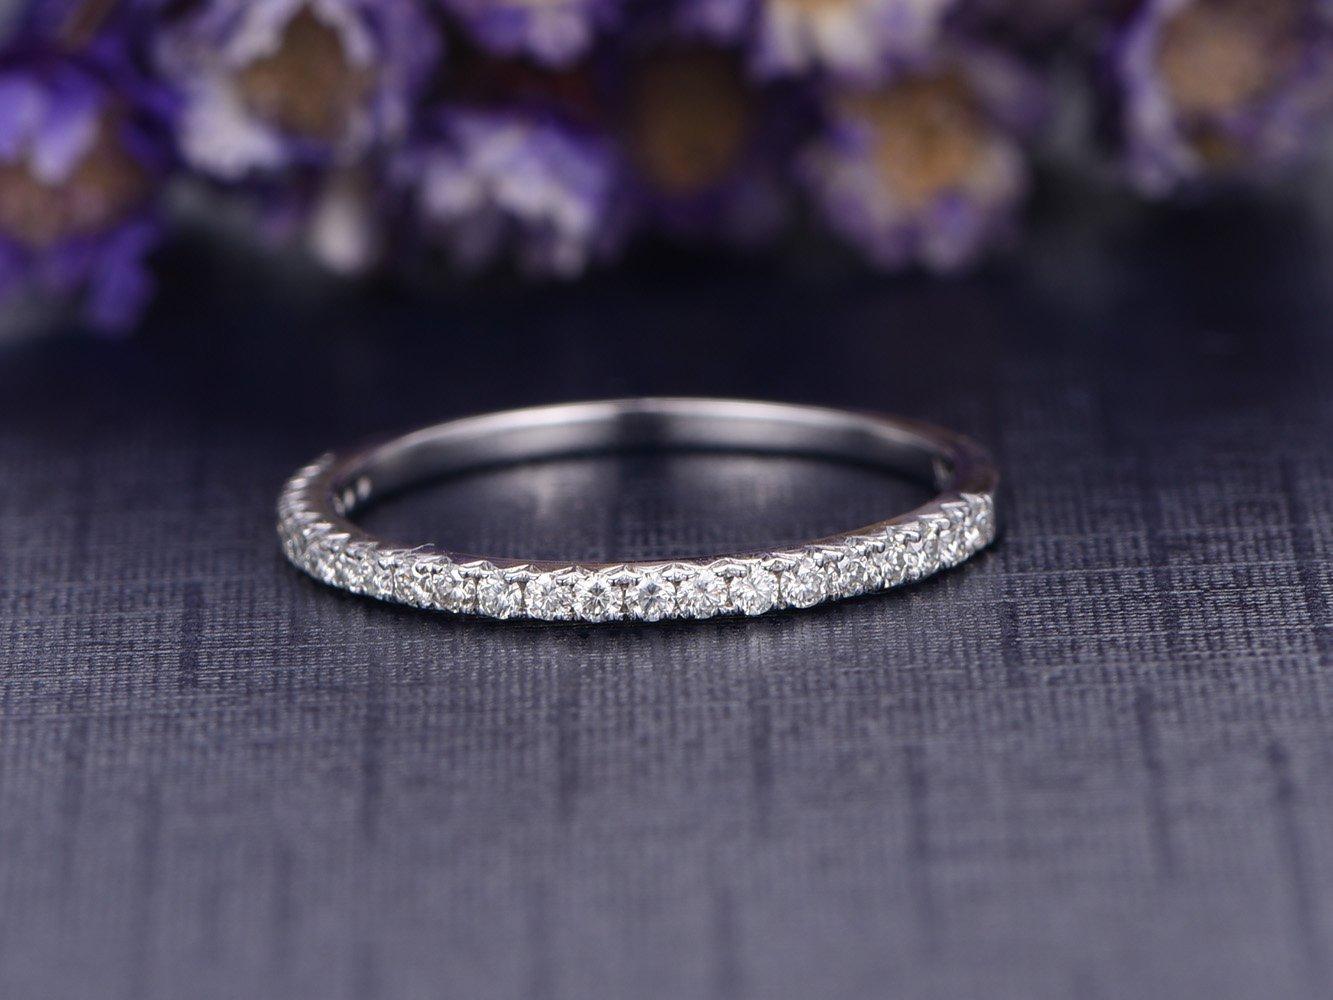 Petite V Pave Diamond Wedding Band,Half Eternity 14K White Gold Reco Bridal Promise Ring,Diamond Engagement Ring,Anniversary,Thin Band by Myraygem